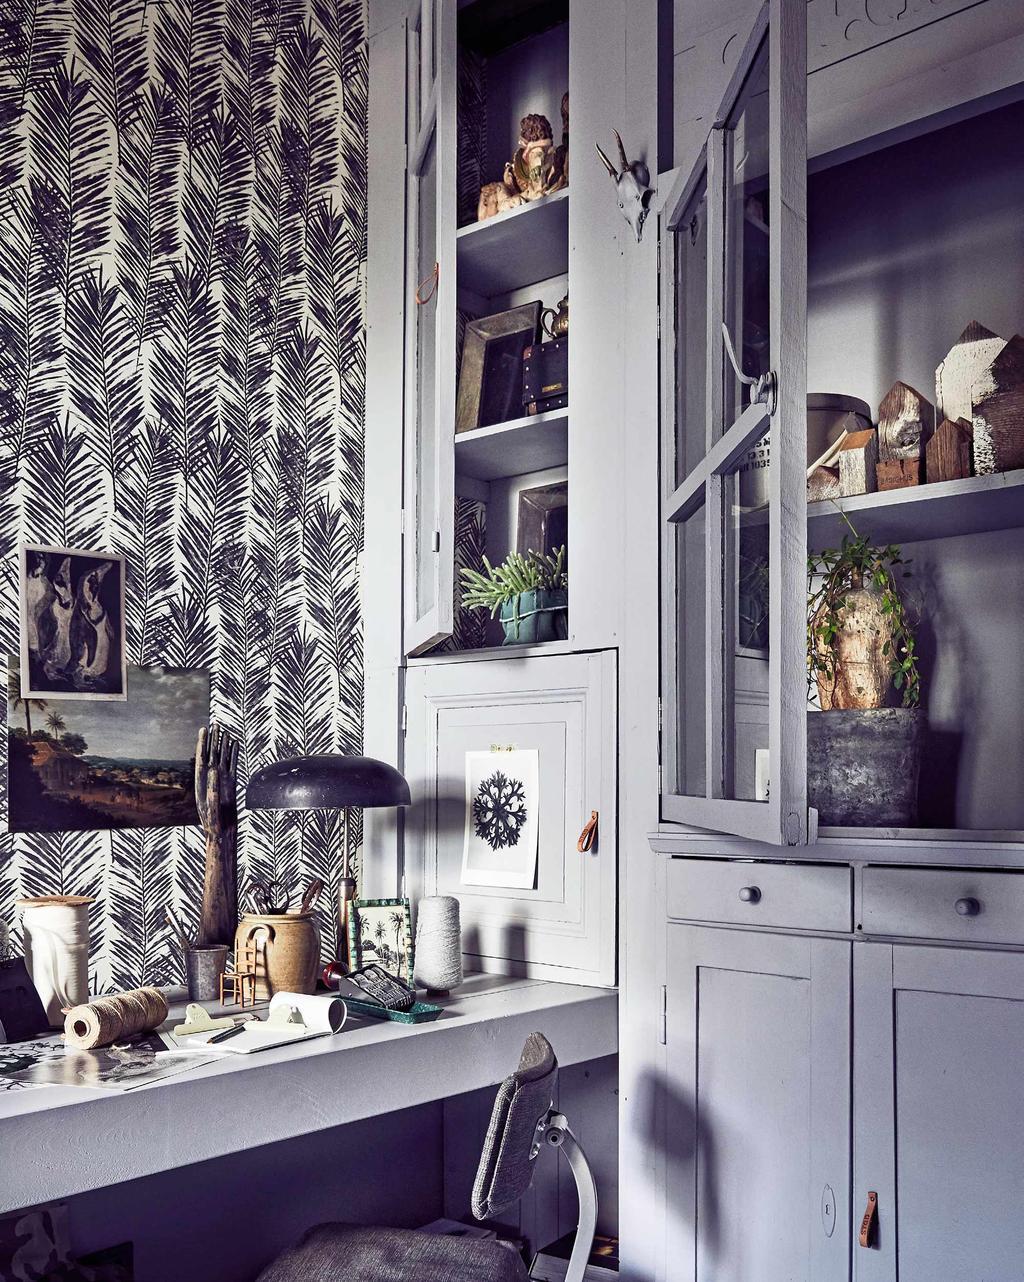 Warm interieur met grijze werkplek met botanisch behang en vitrinekast om in op te bergen